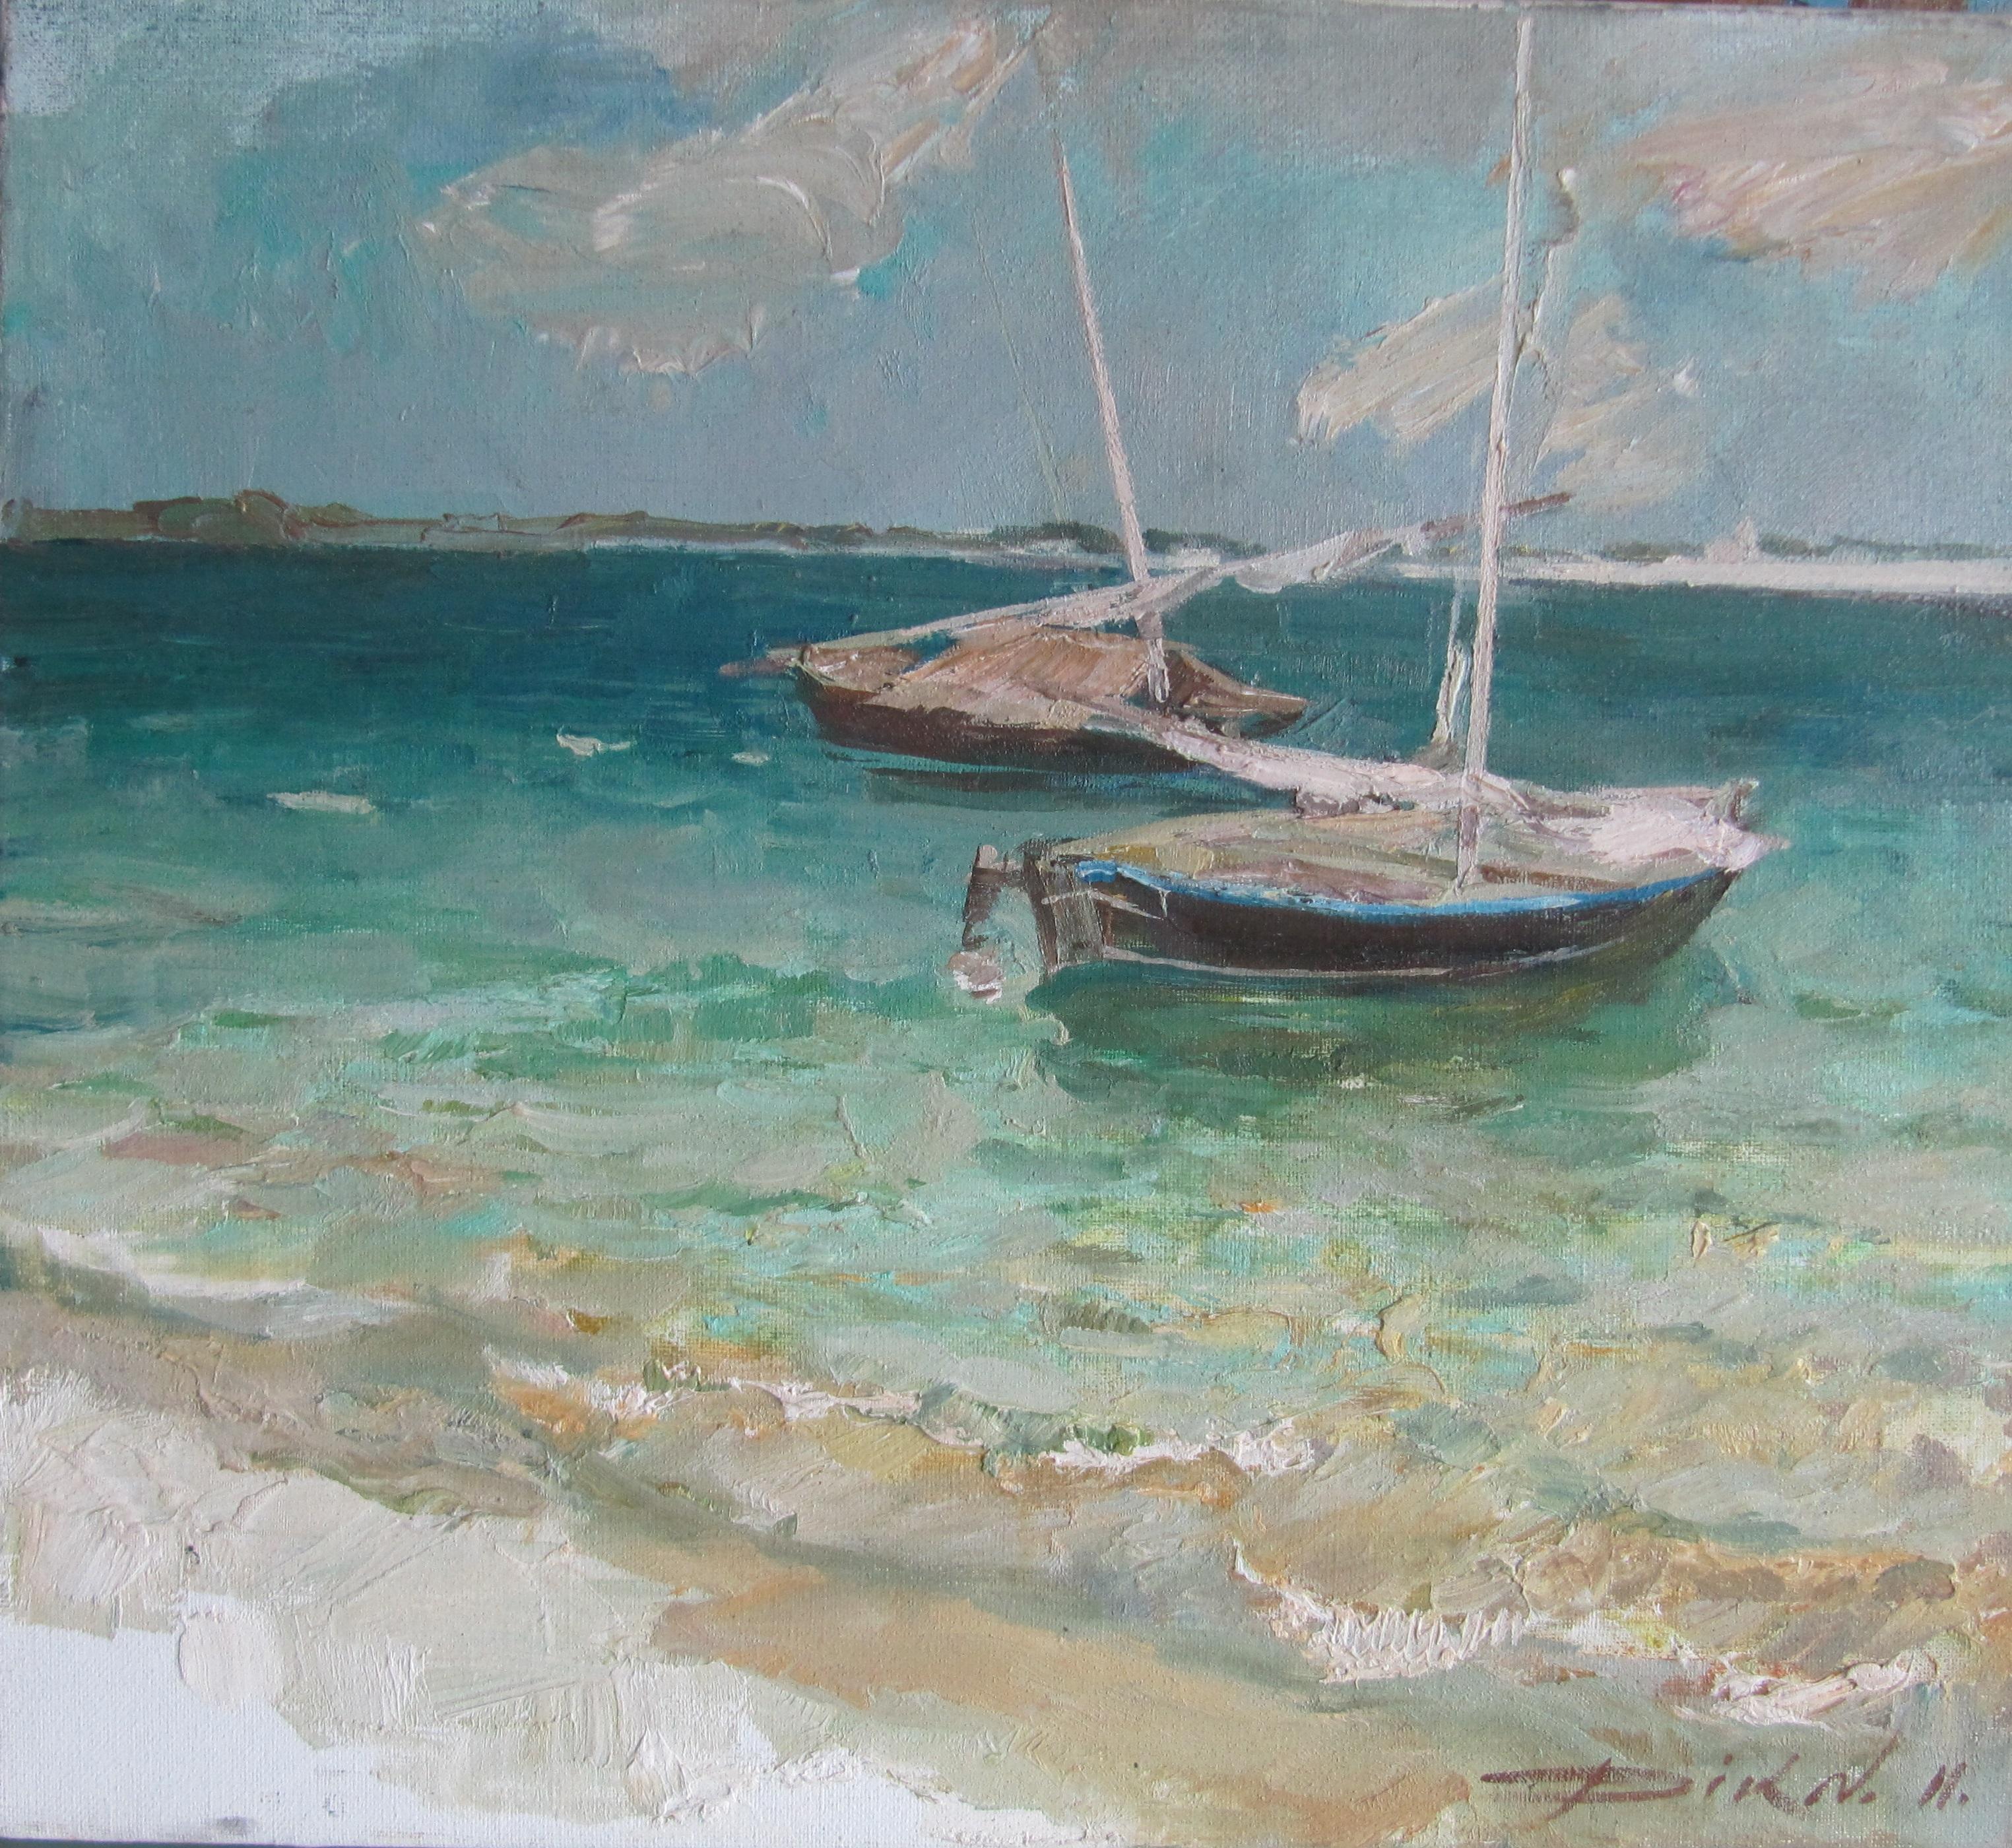 Natalia dik  dow boot in oceaan  olieverf  45 x 50  e. 1350 00